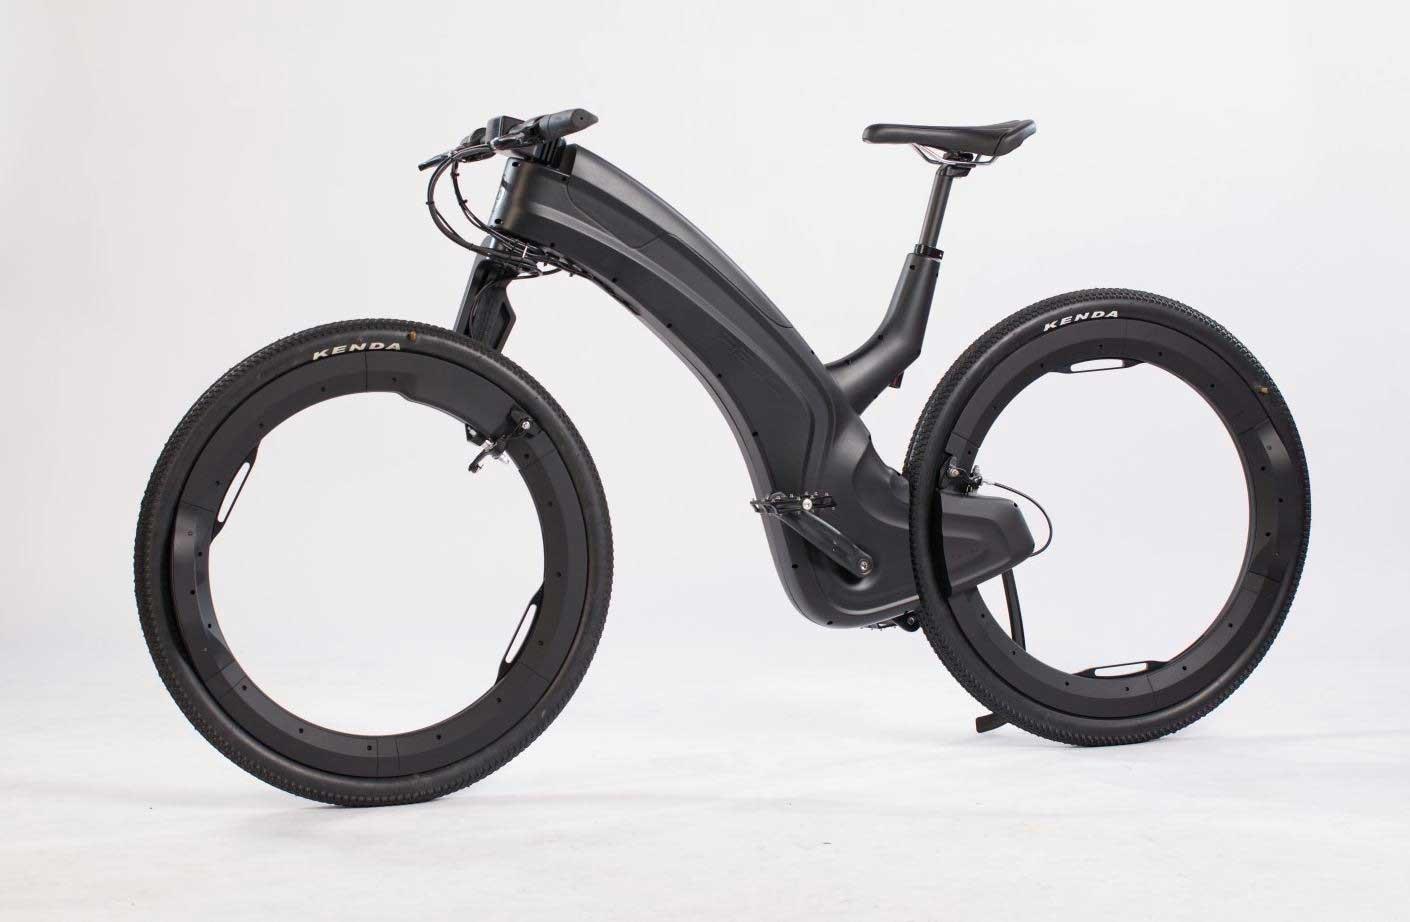 Reevo Hubless Bike Review